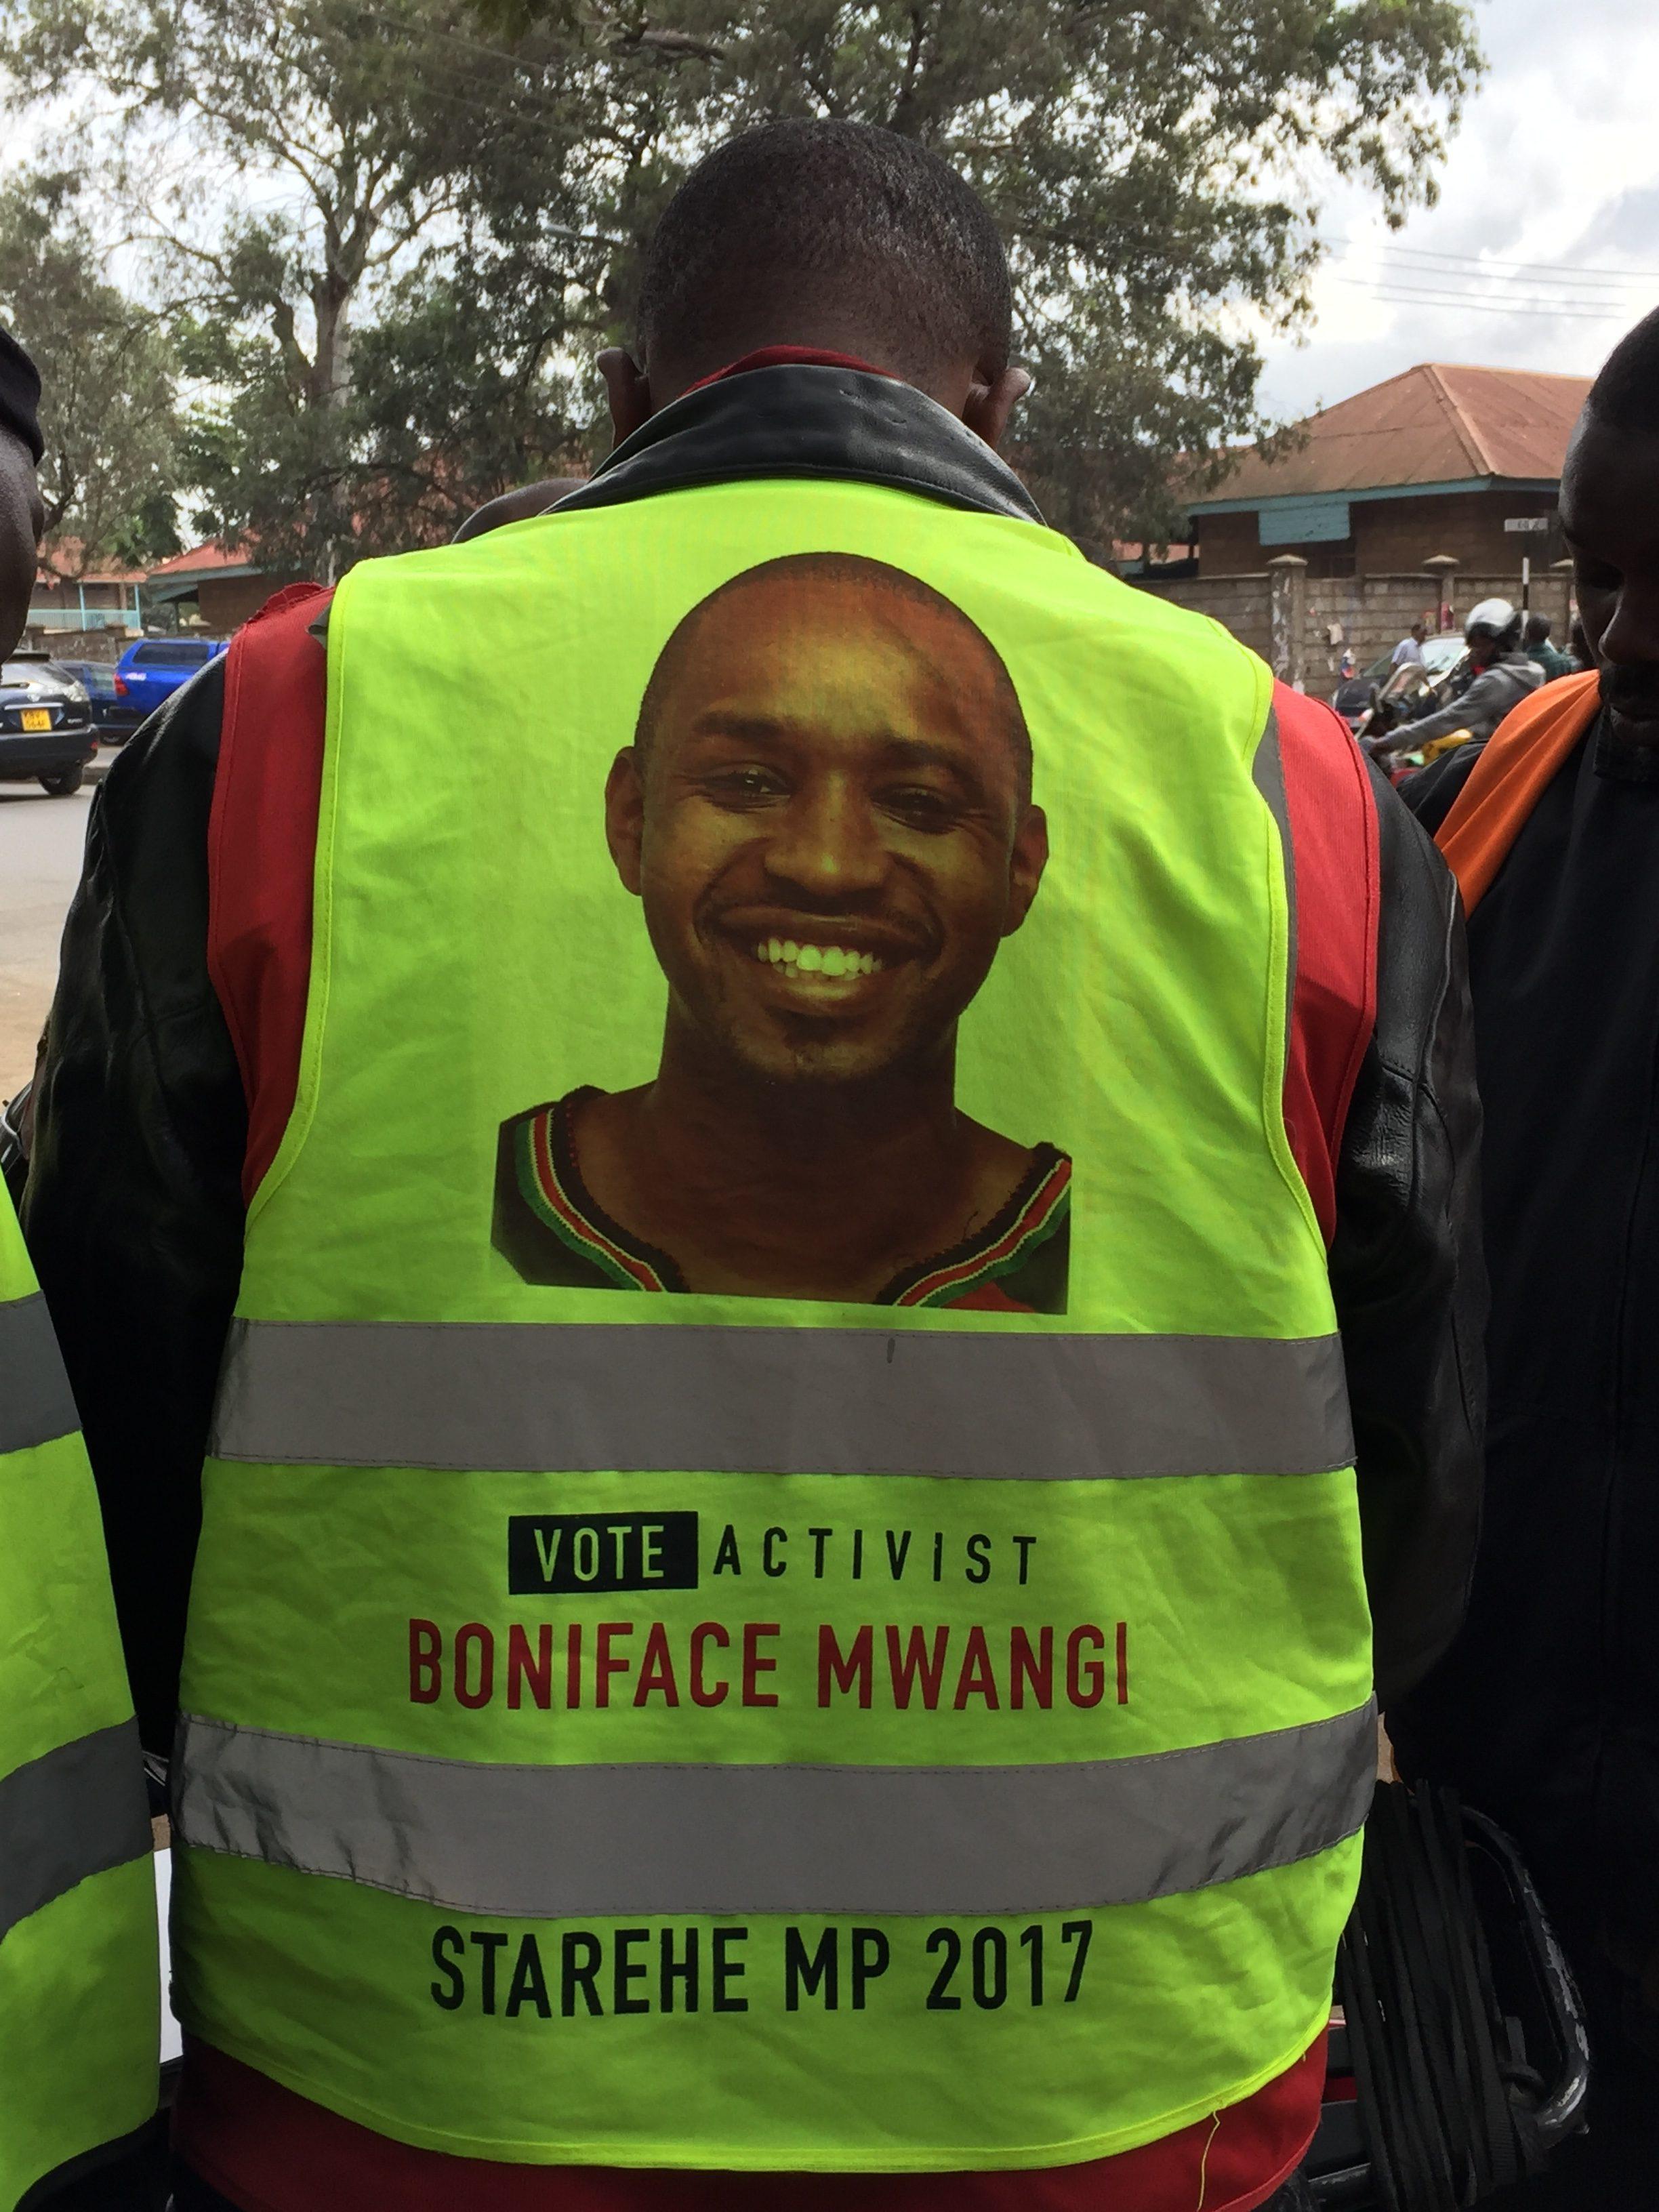 Kenyan Activist Boniface Mwangi Campaigns Despite Death Threats (2 of 2) – Periscope/Storyhunter Livestream (image)